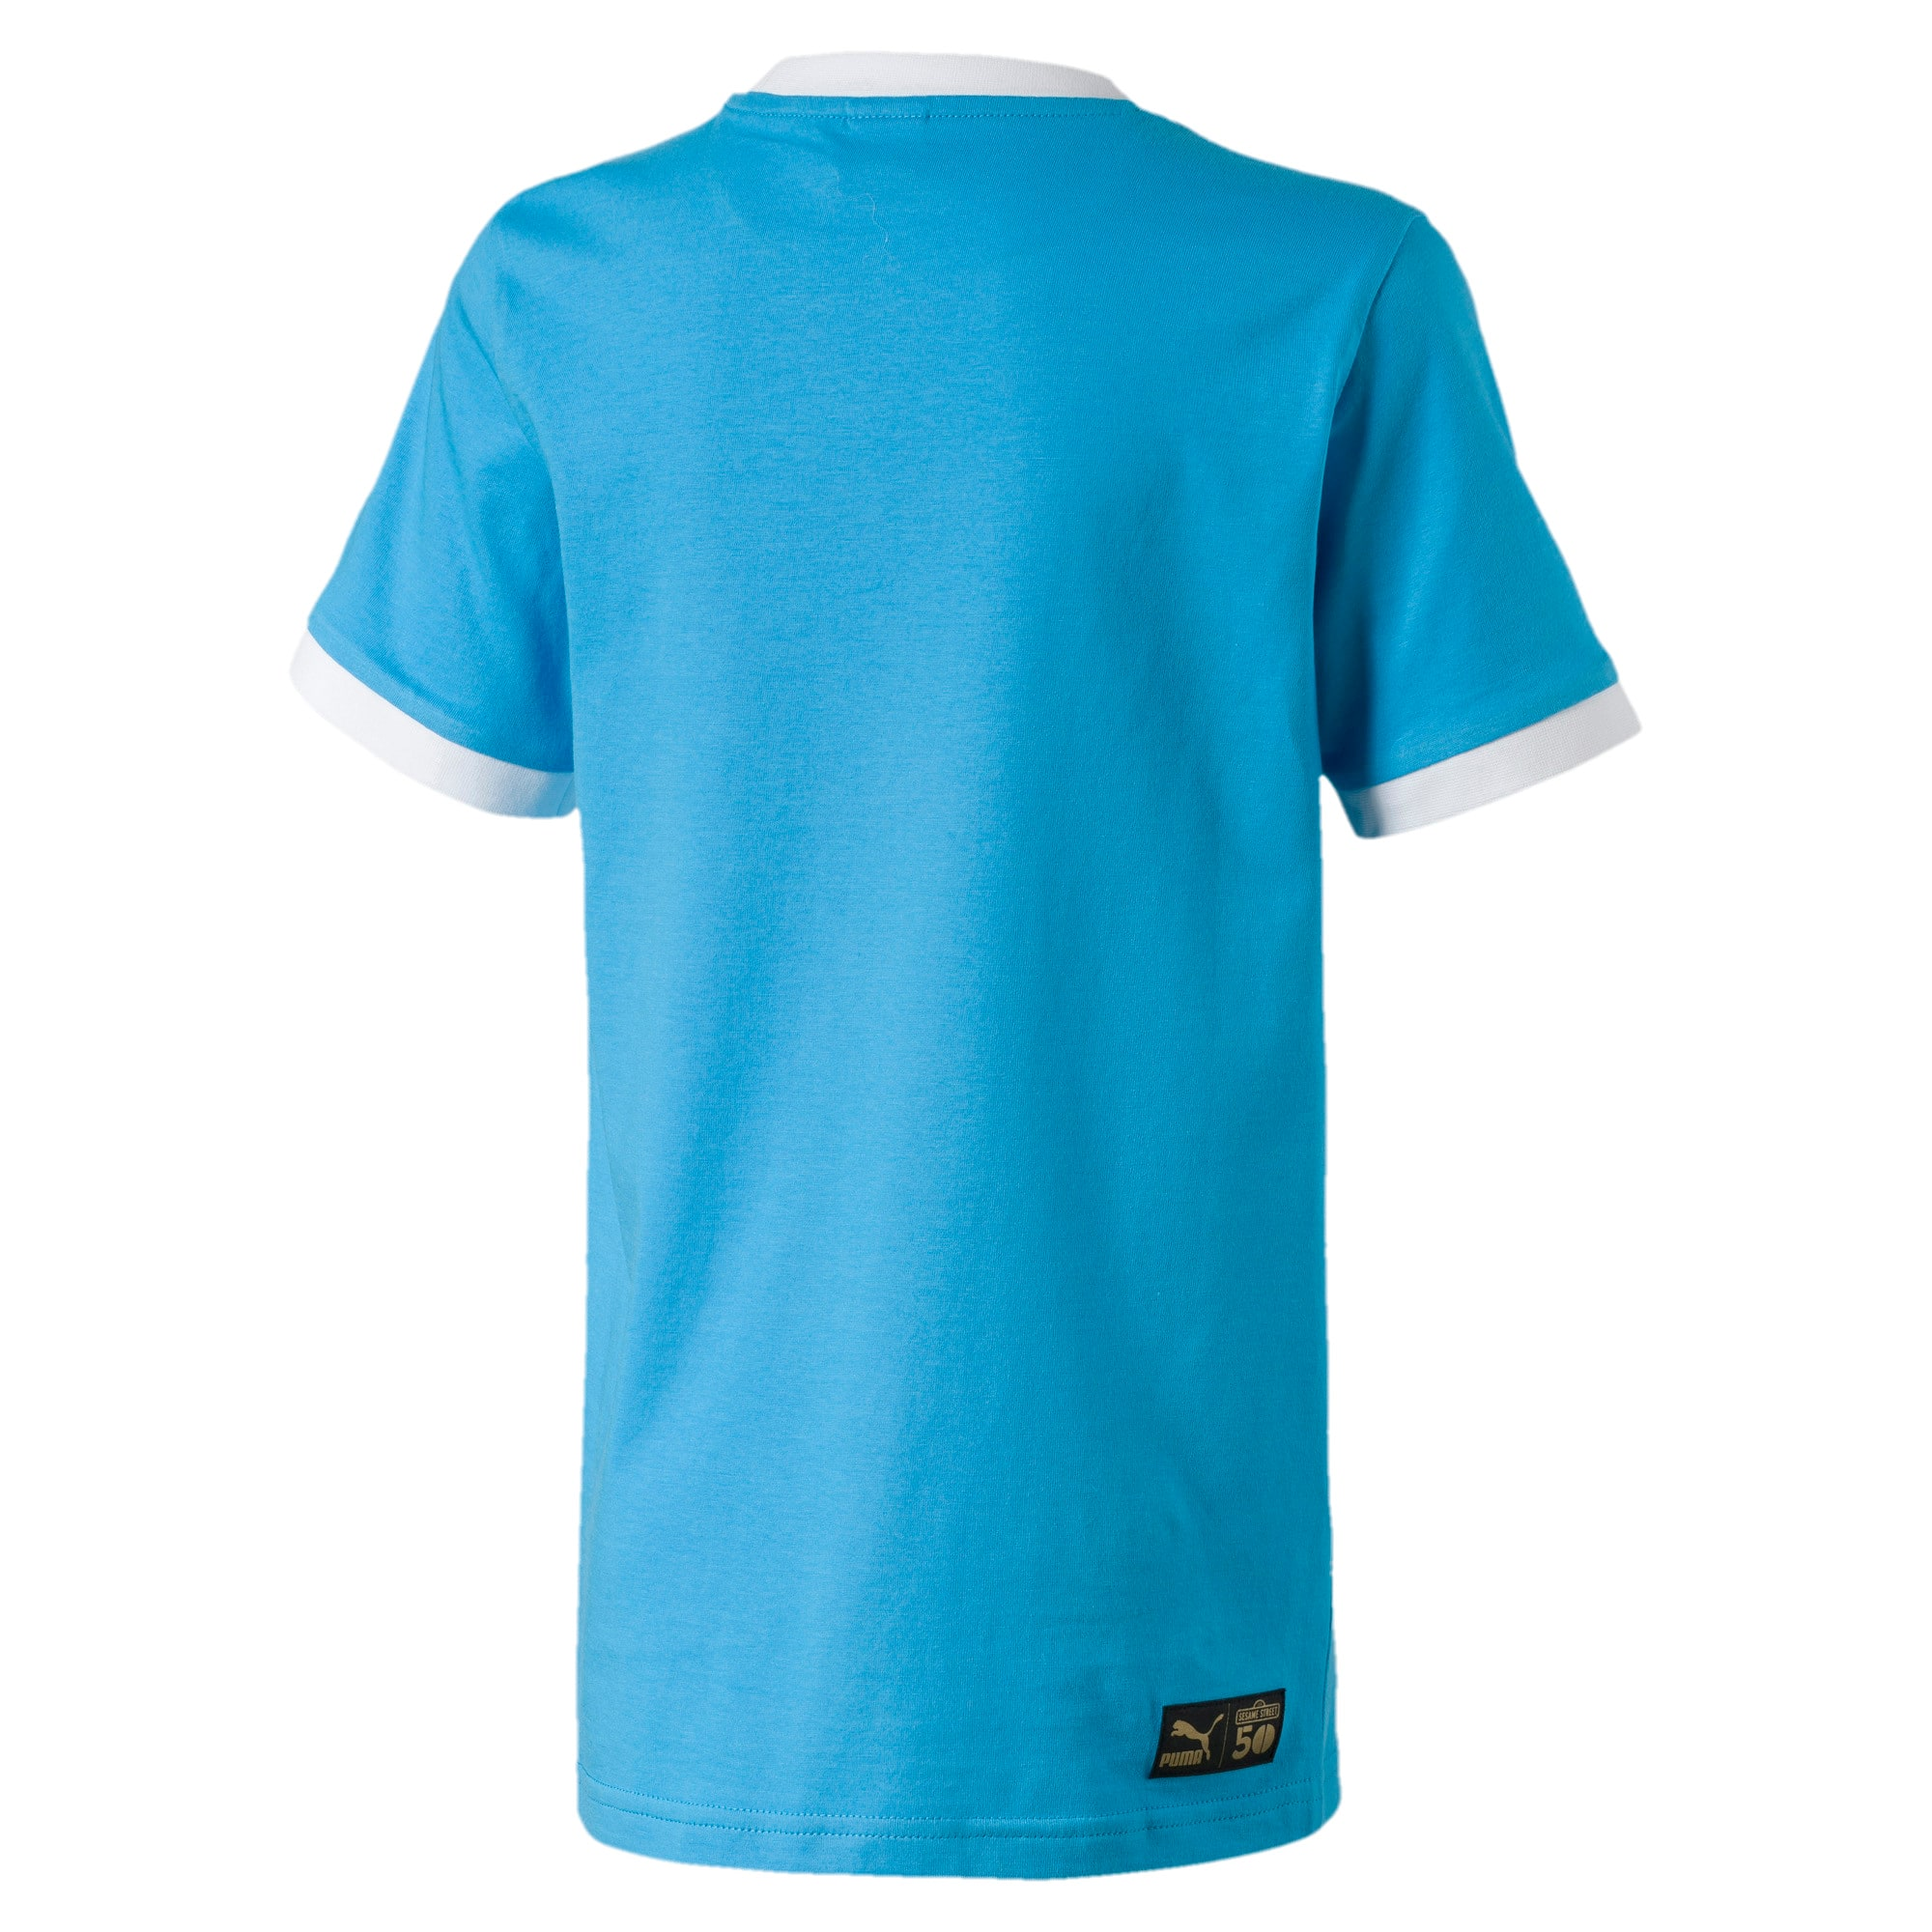 Thumbnail 3 of キッズ セサミストリート SS グラフィック Tシャツ (半袖), Bleu Azur, medium-JPN